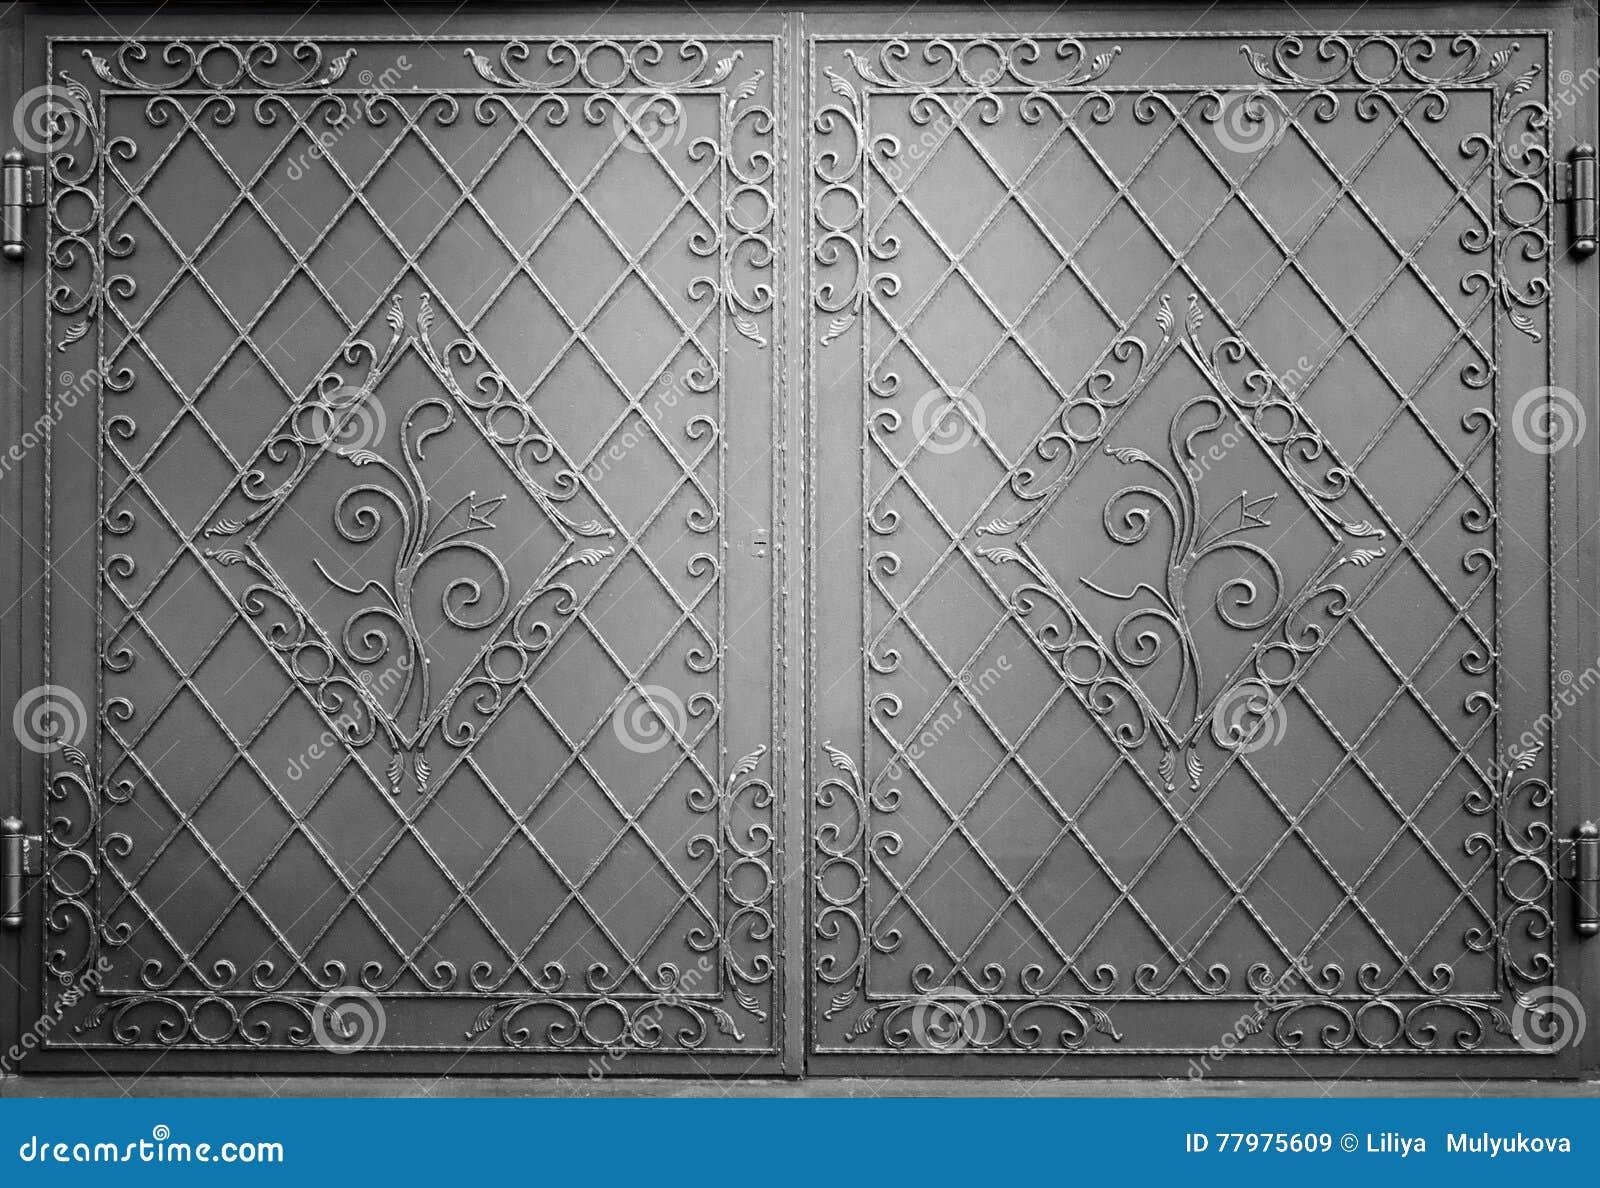 Decorative metal gate stock image  Image of heavy, design - 77975609